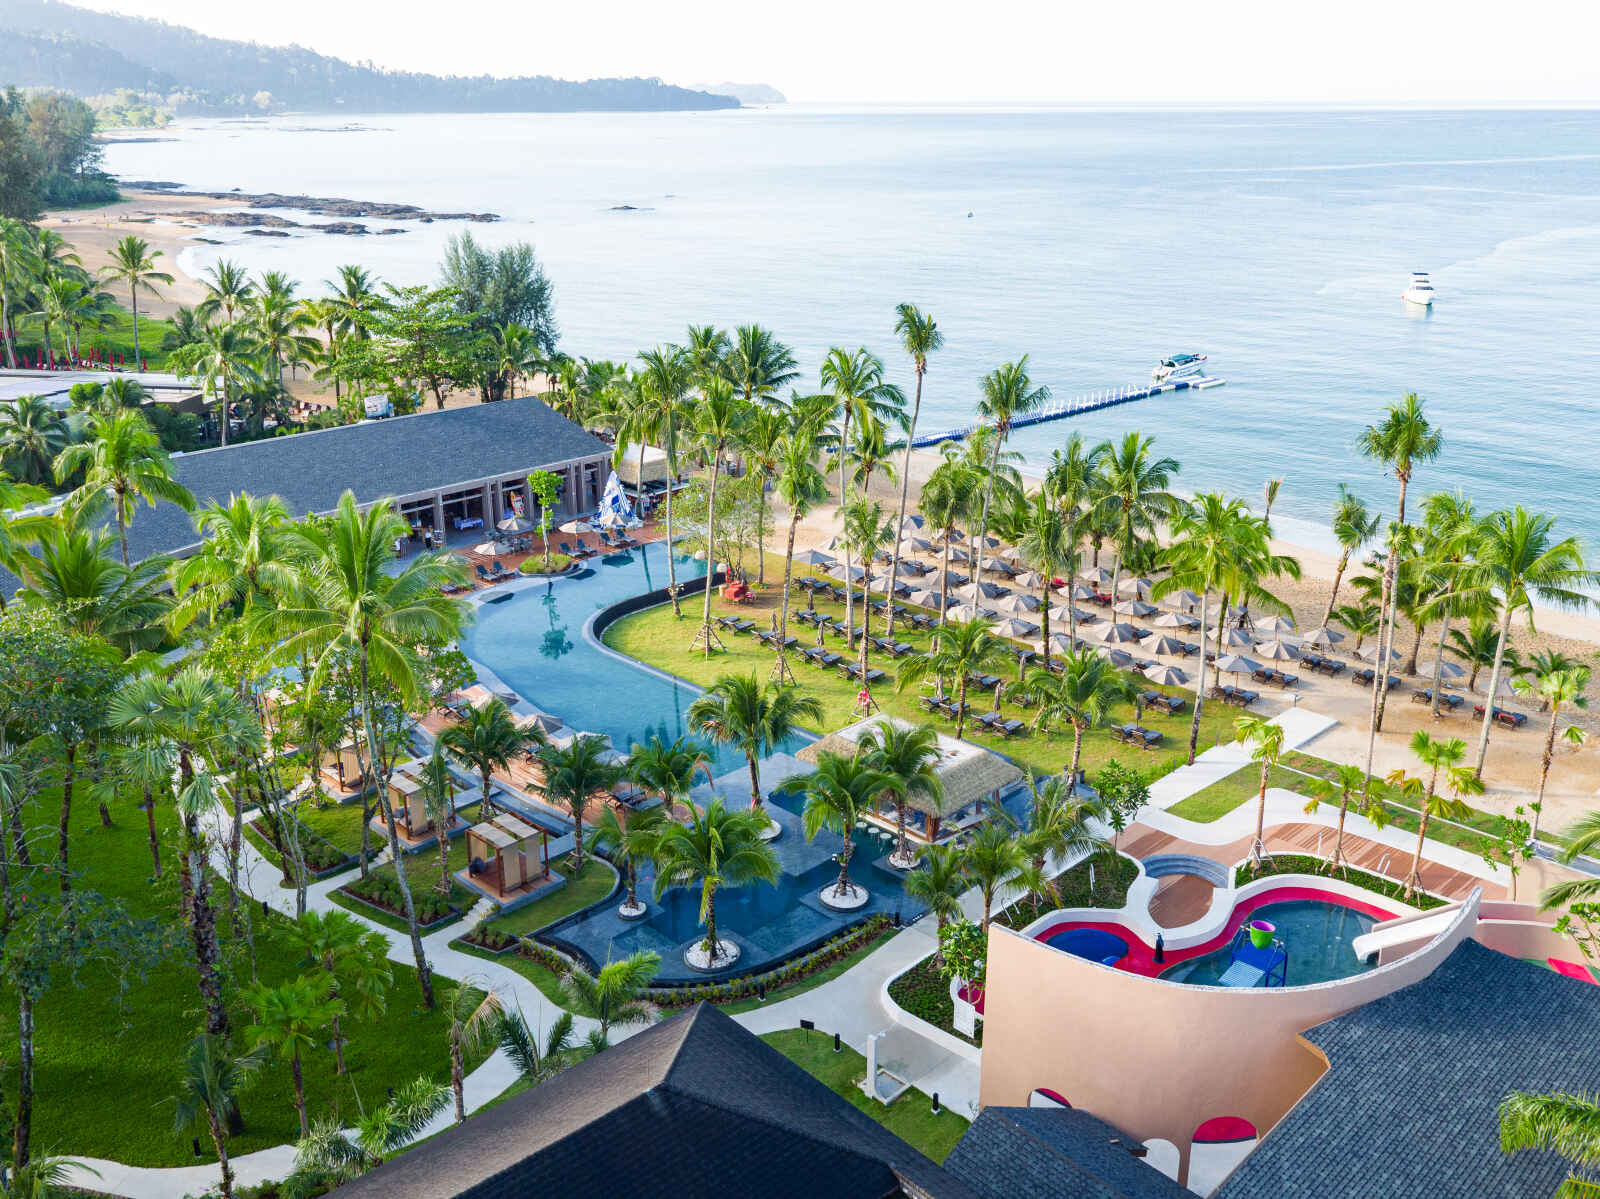 Thaïlande - Khao Lak - Hôtel La Flora Khao Lak 4* sup